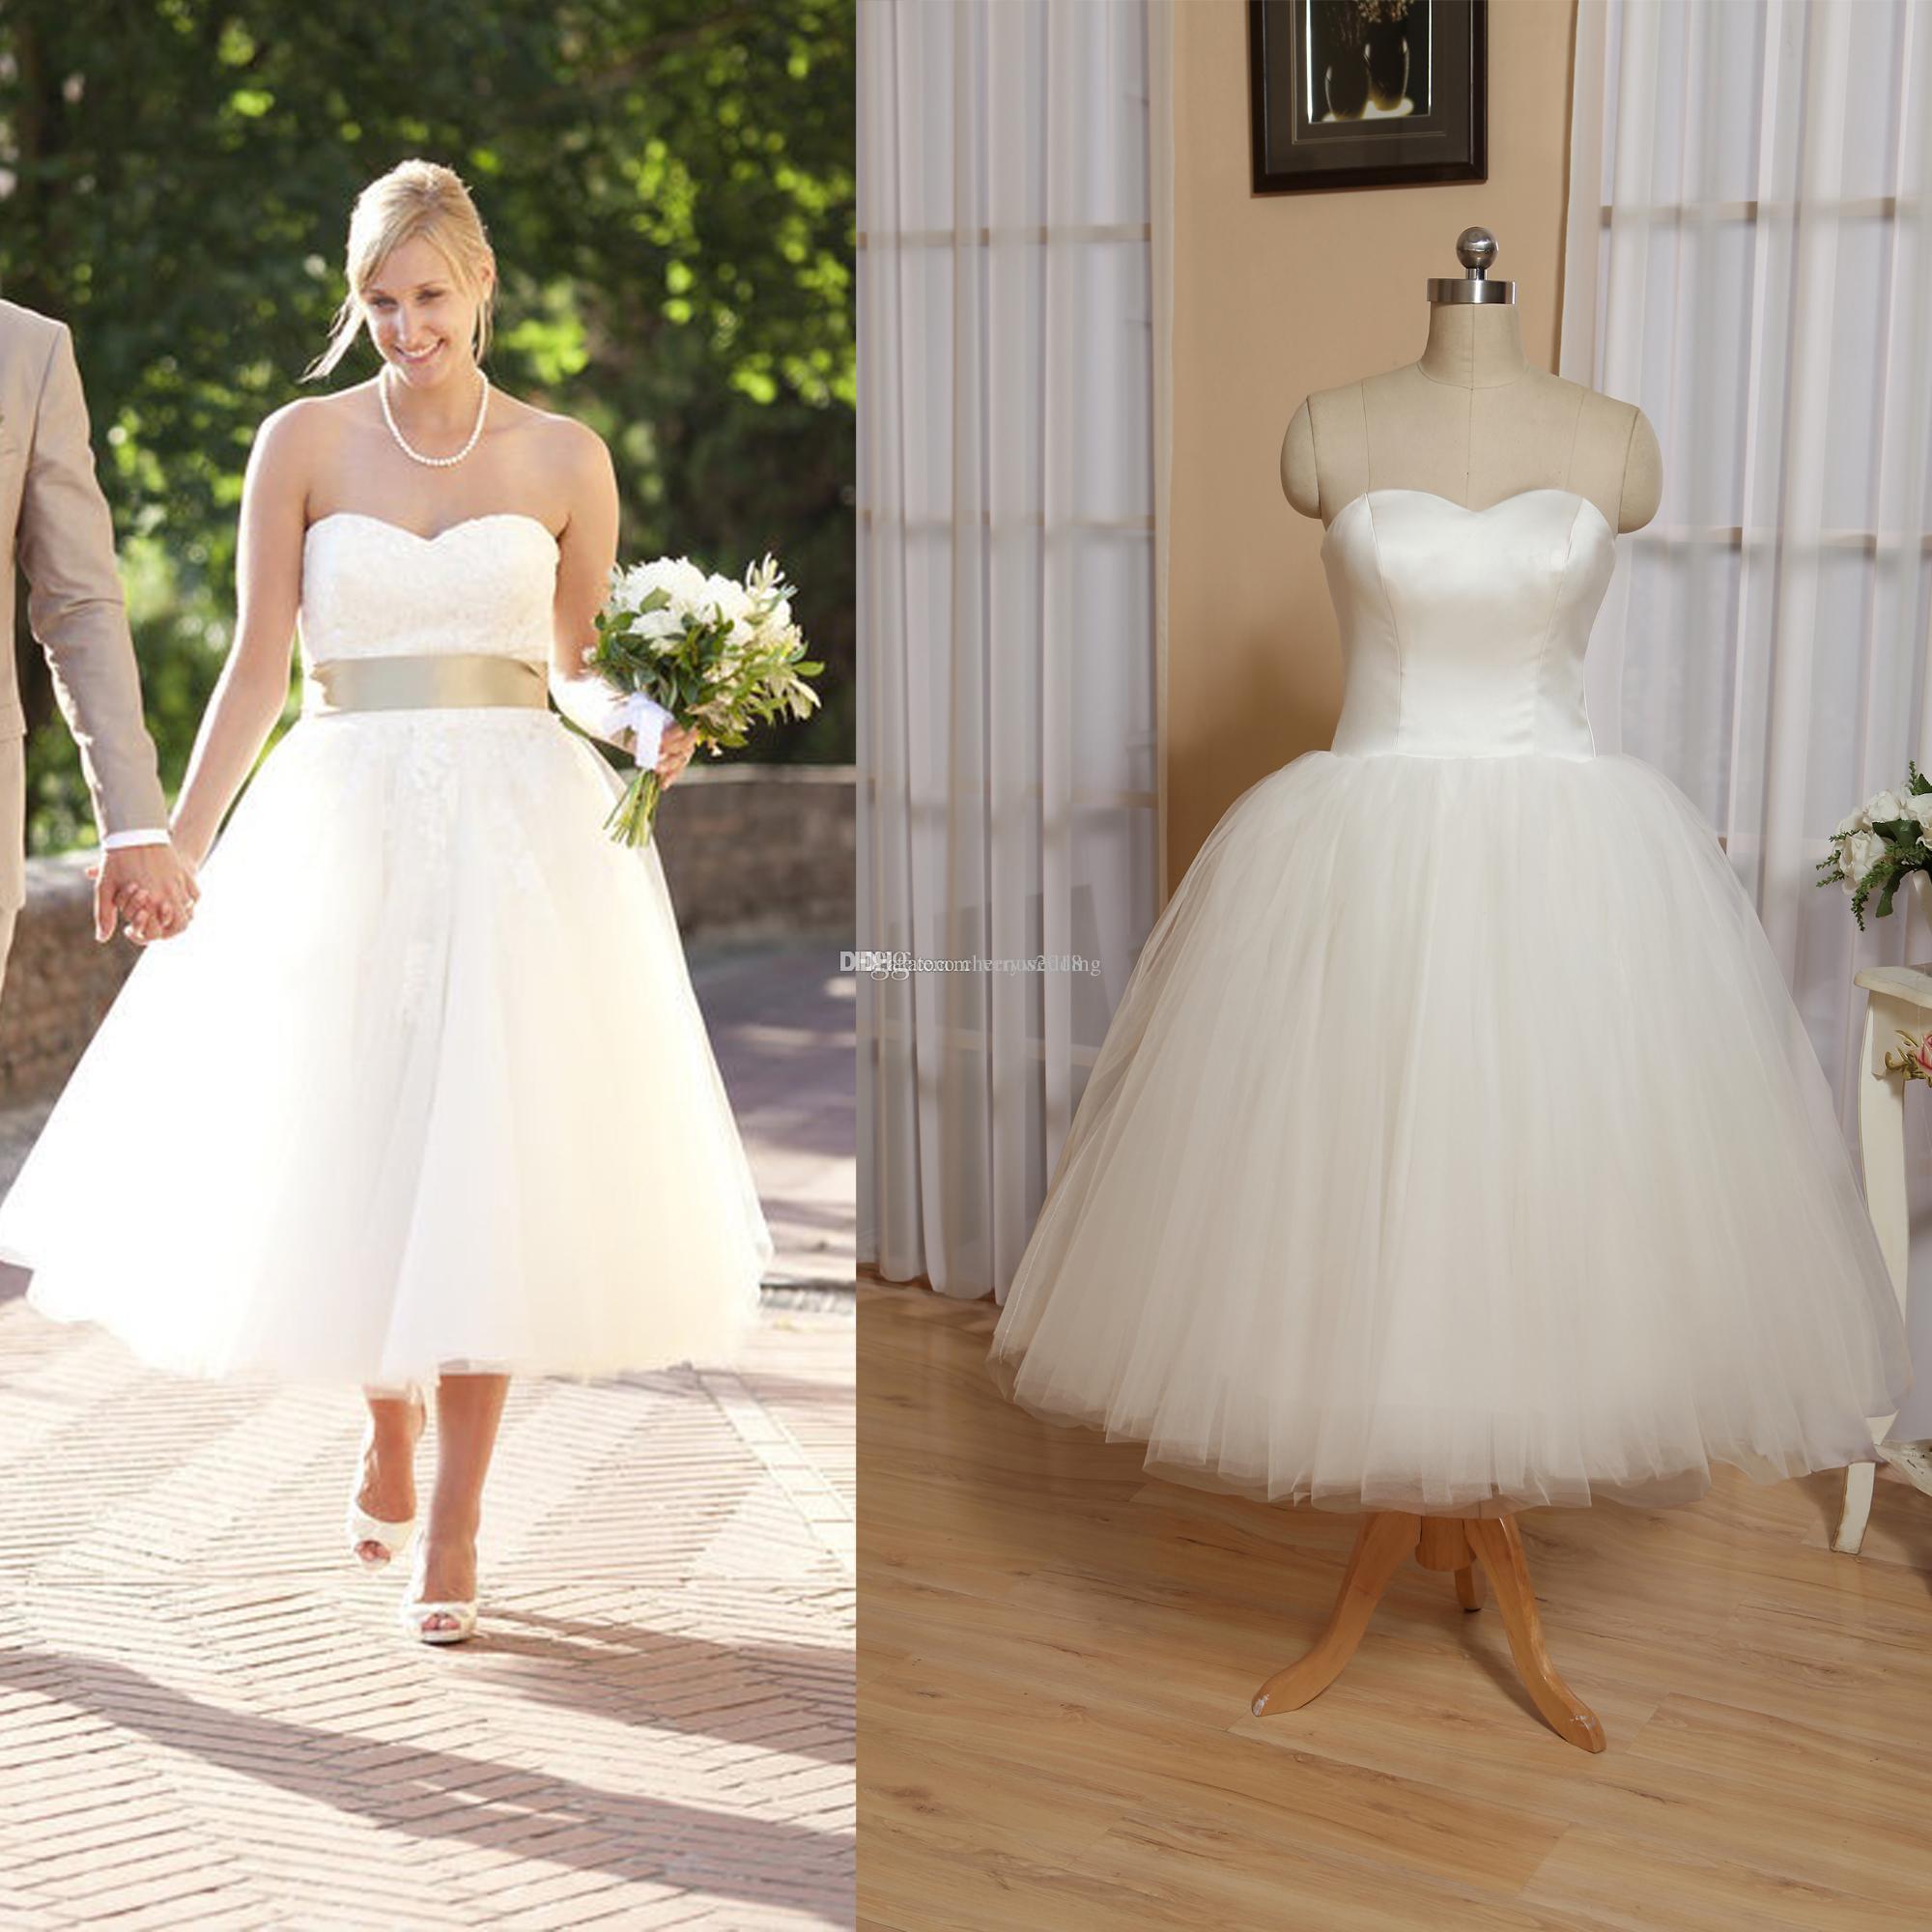 2019 Short Wedding Dress Tulle Skirt Satin Bodice vintage Knee Length Wedding Dresses plus size wedding dresses